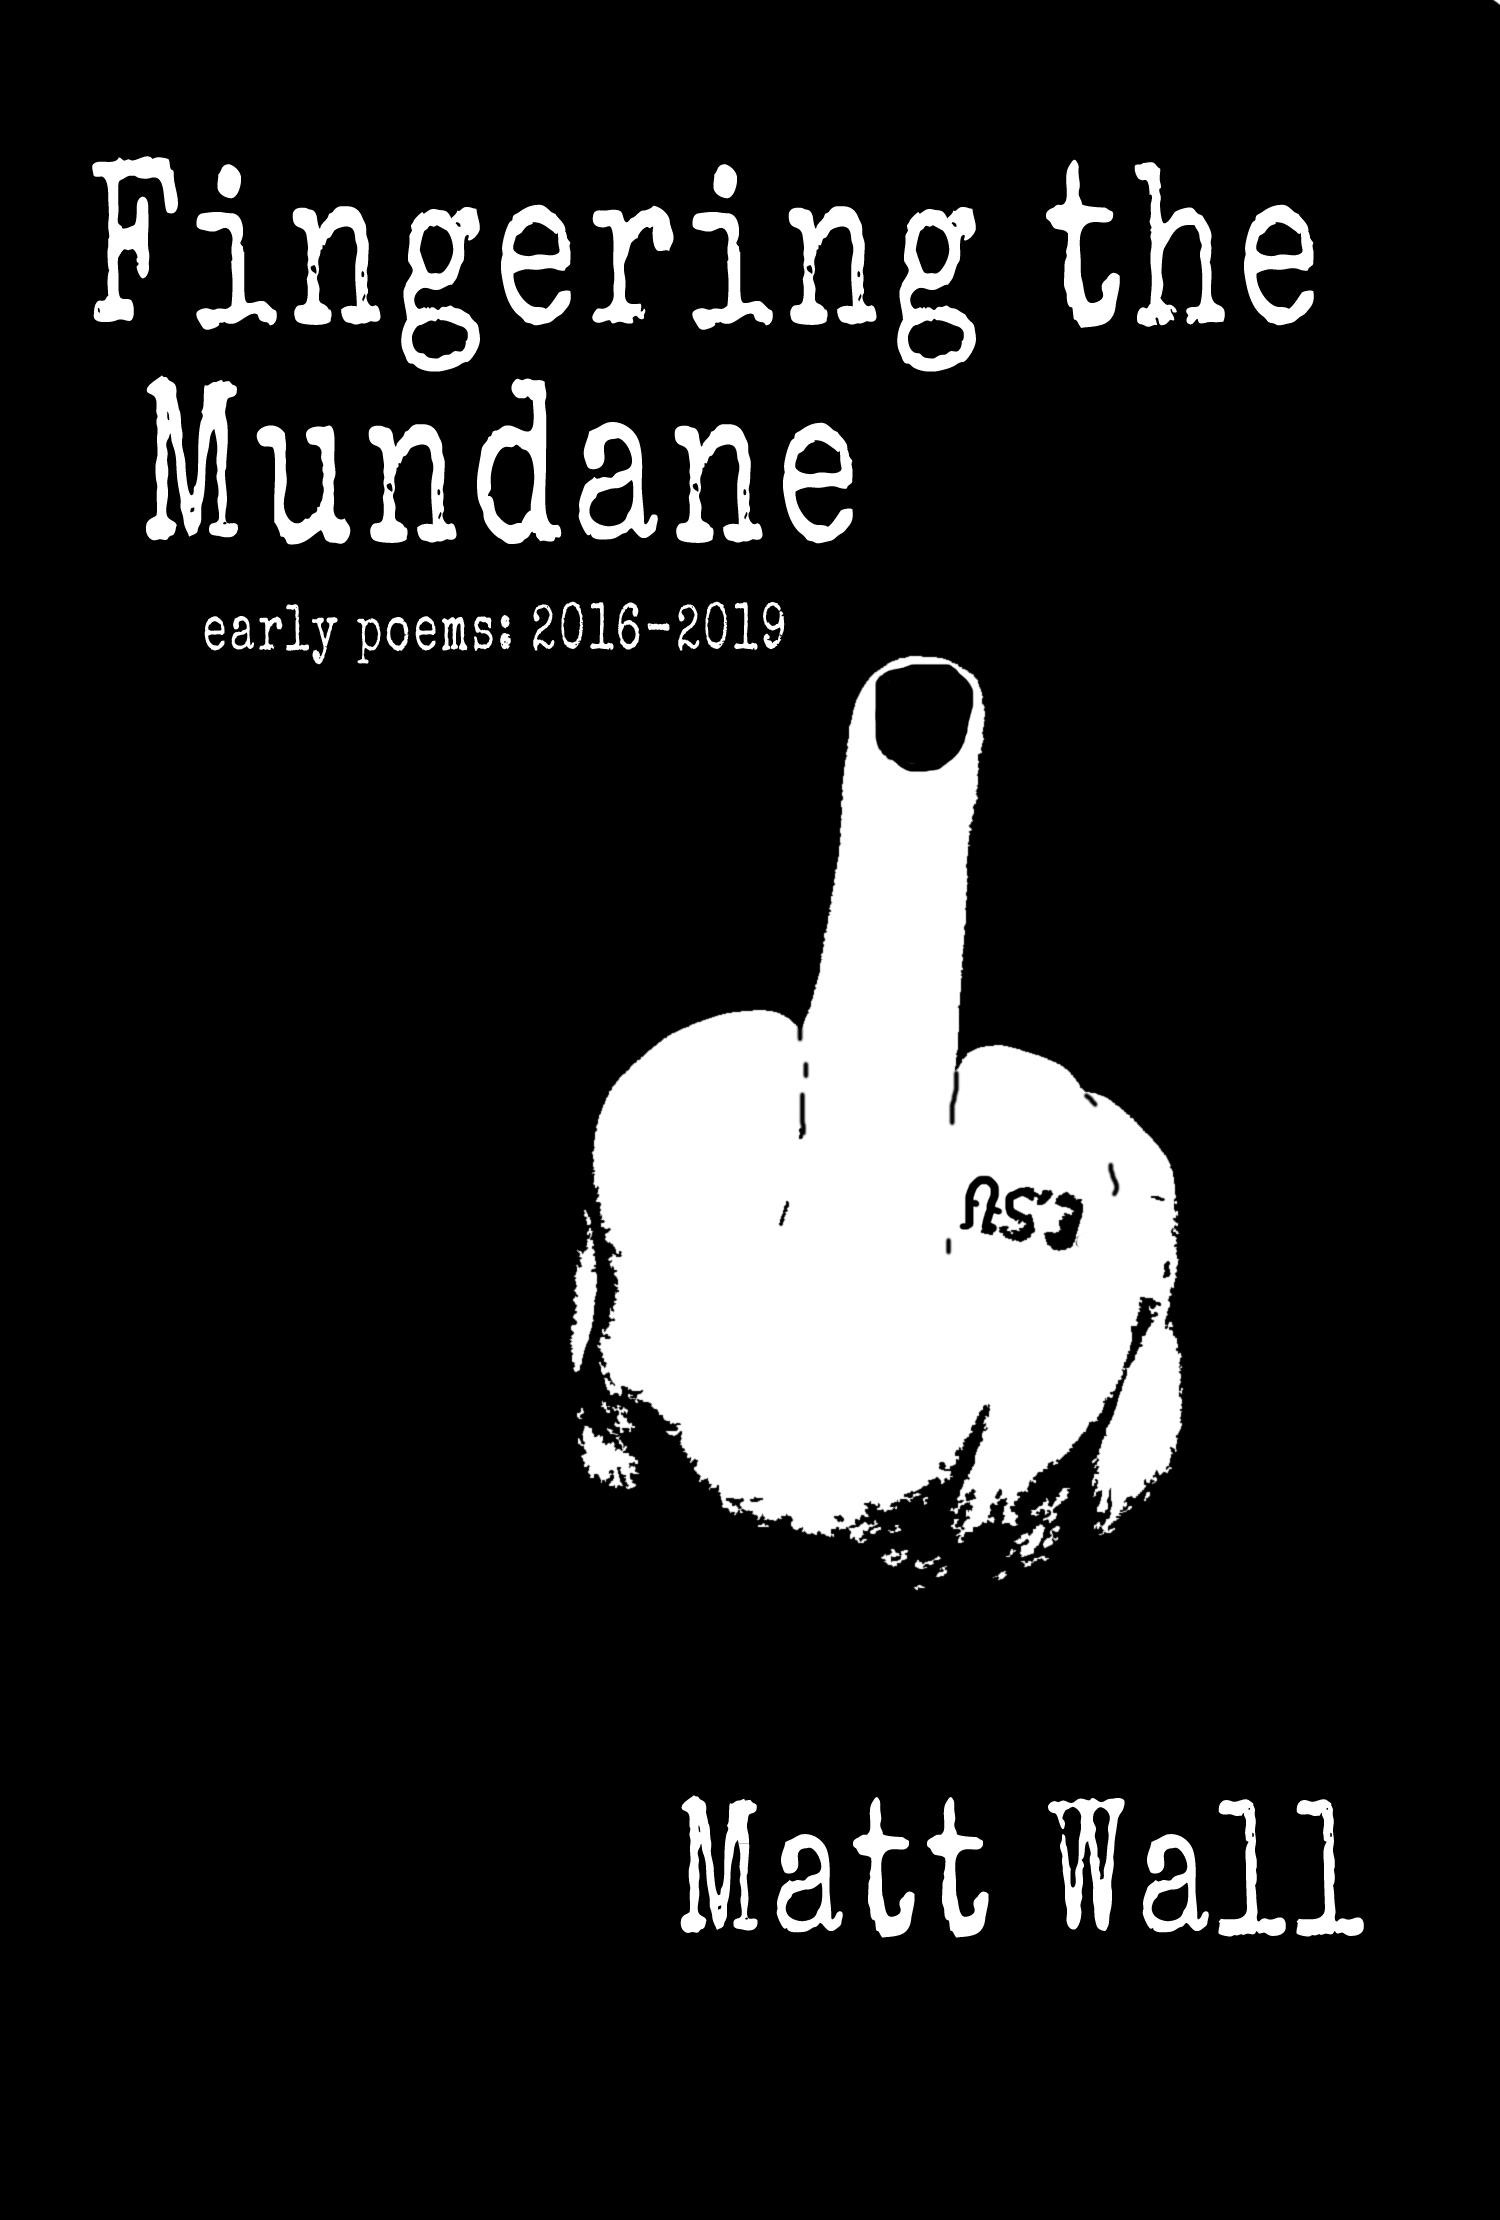 Fingering the Mundane